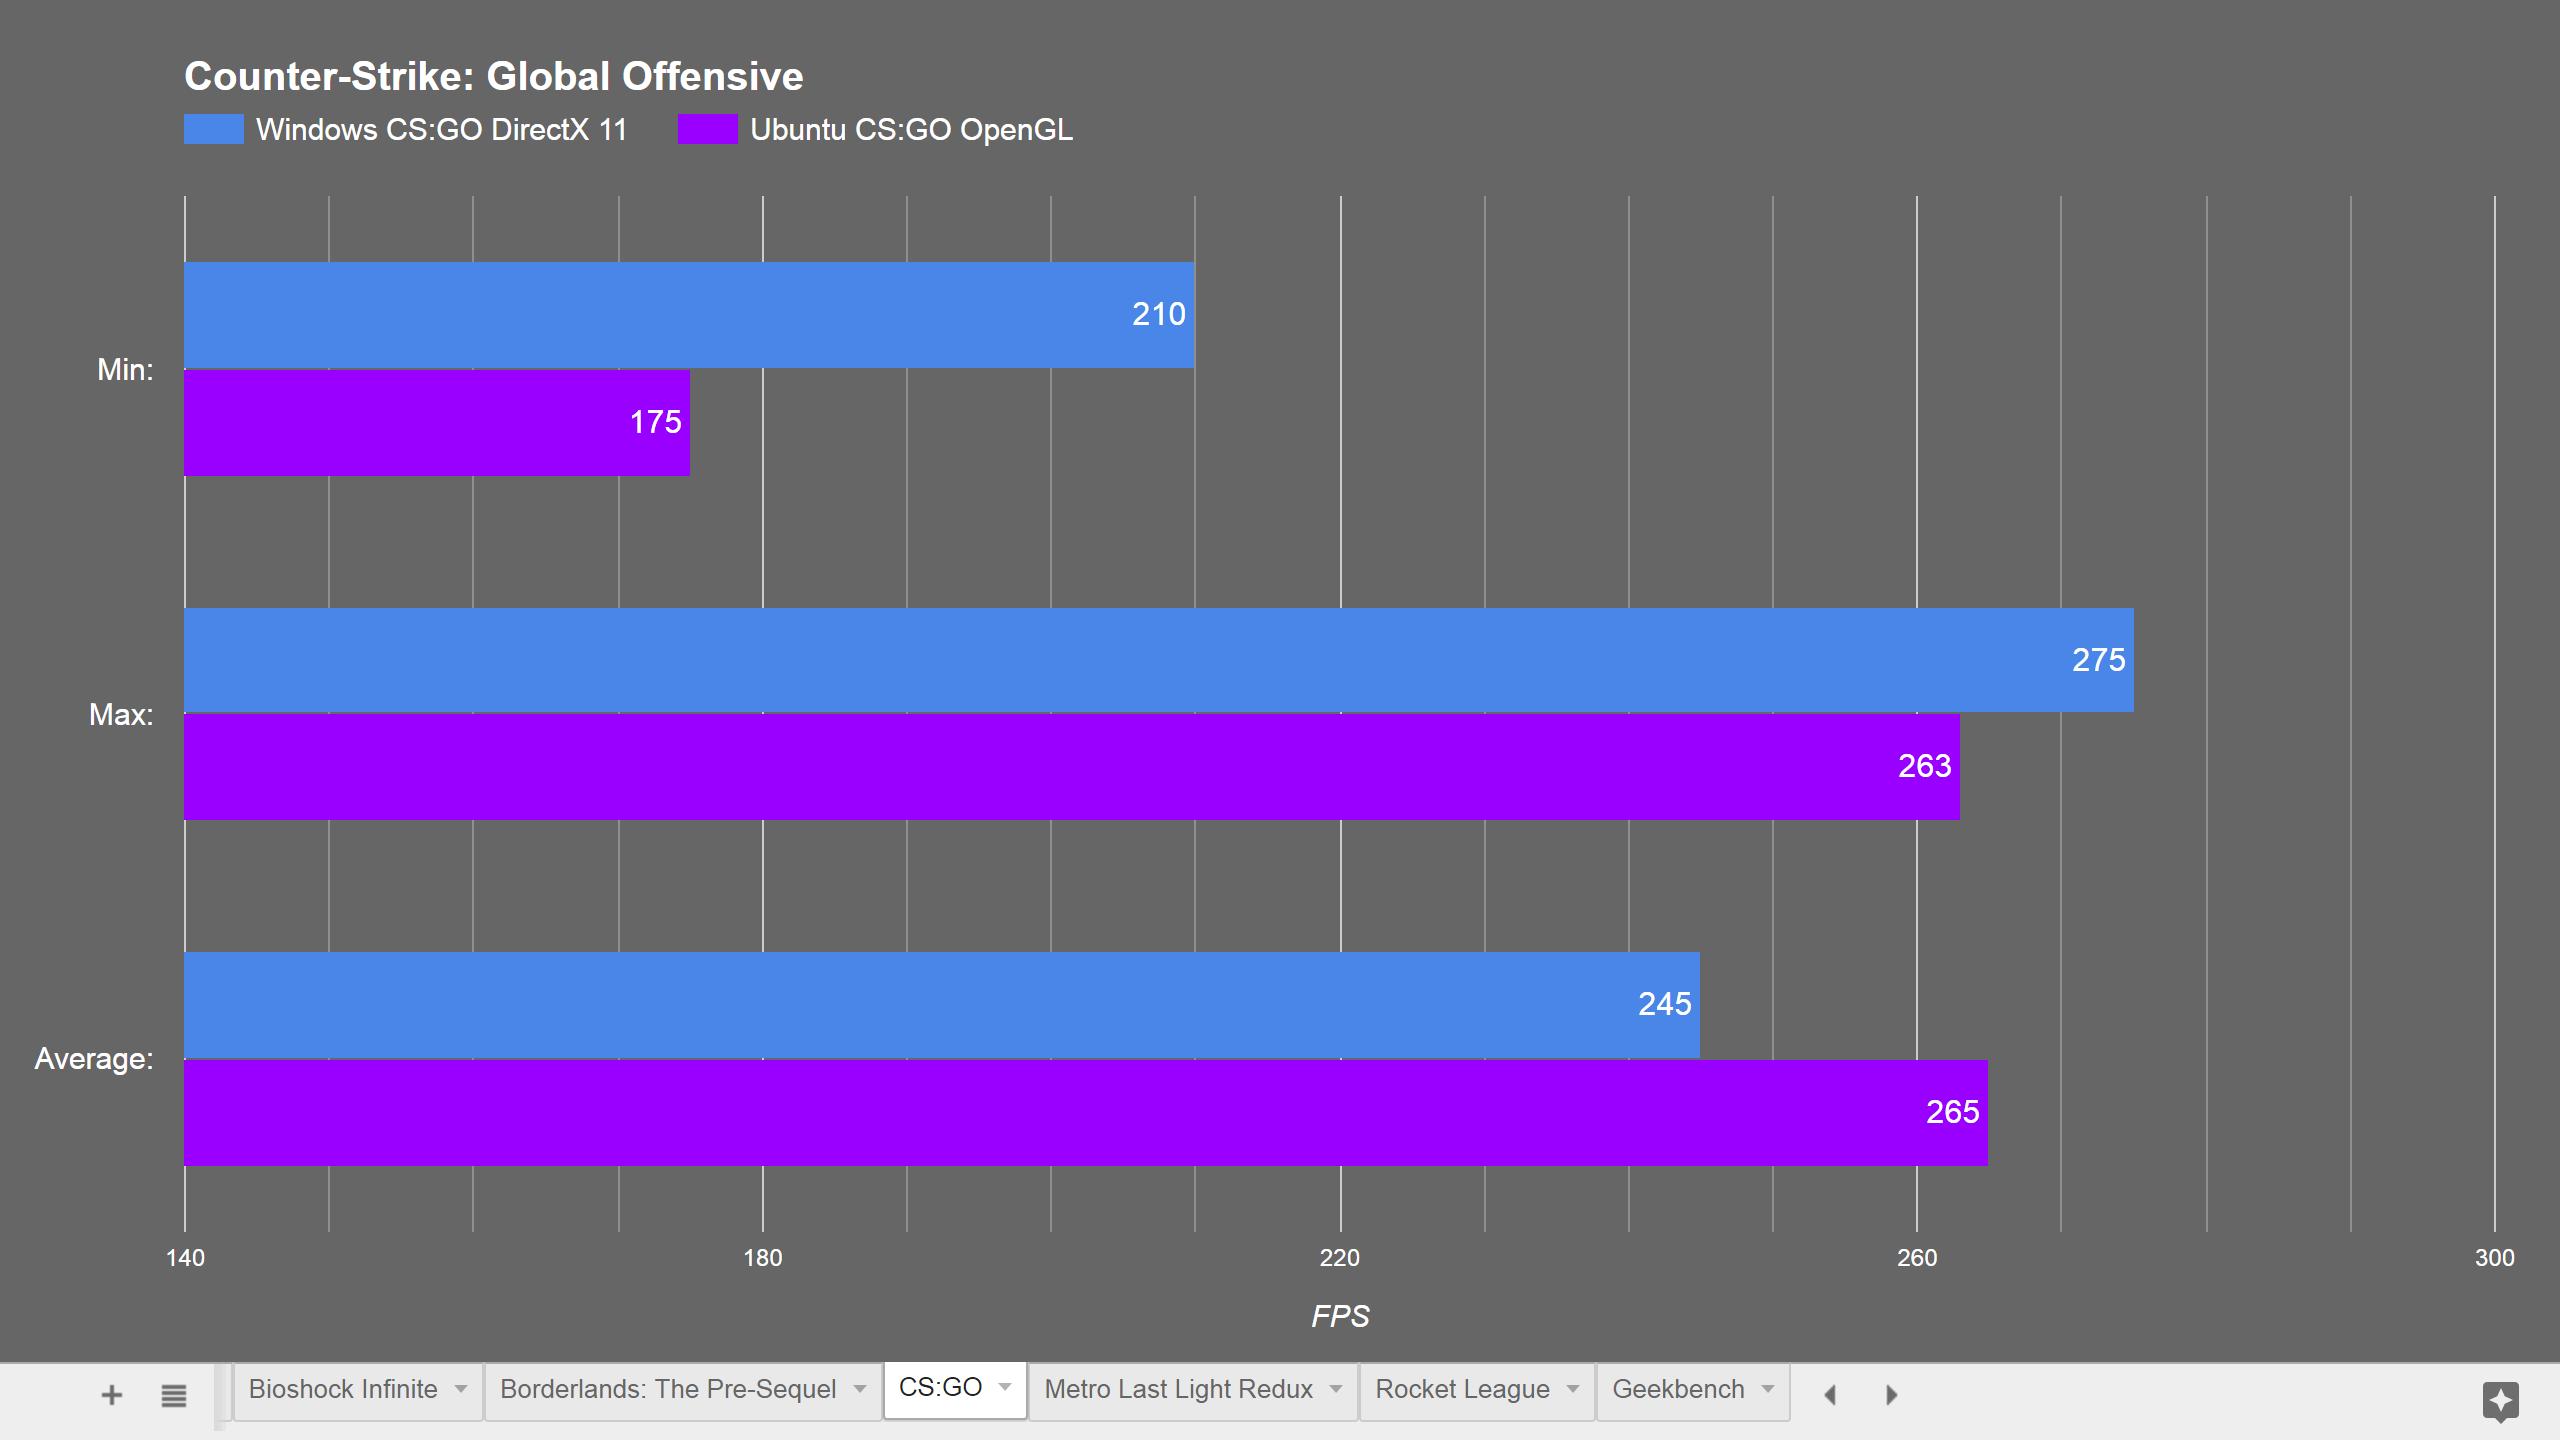 Ubuntu vs Windows - Gaming Performance! - Software